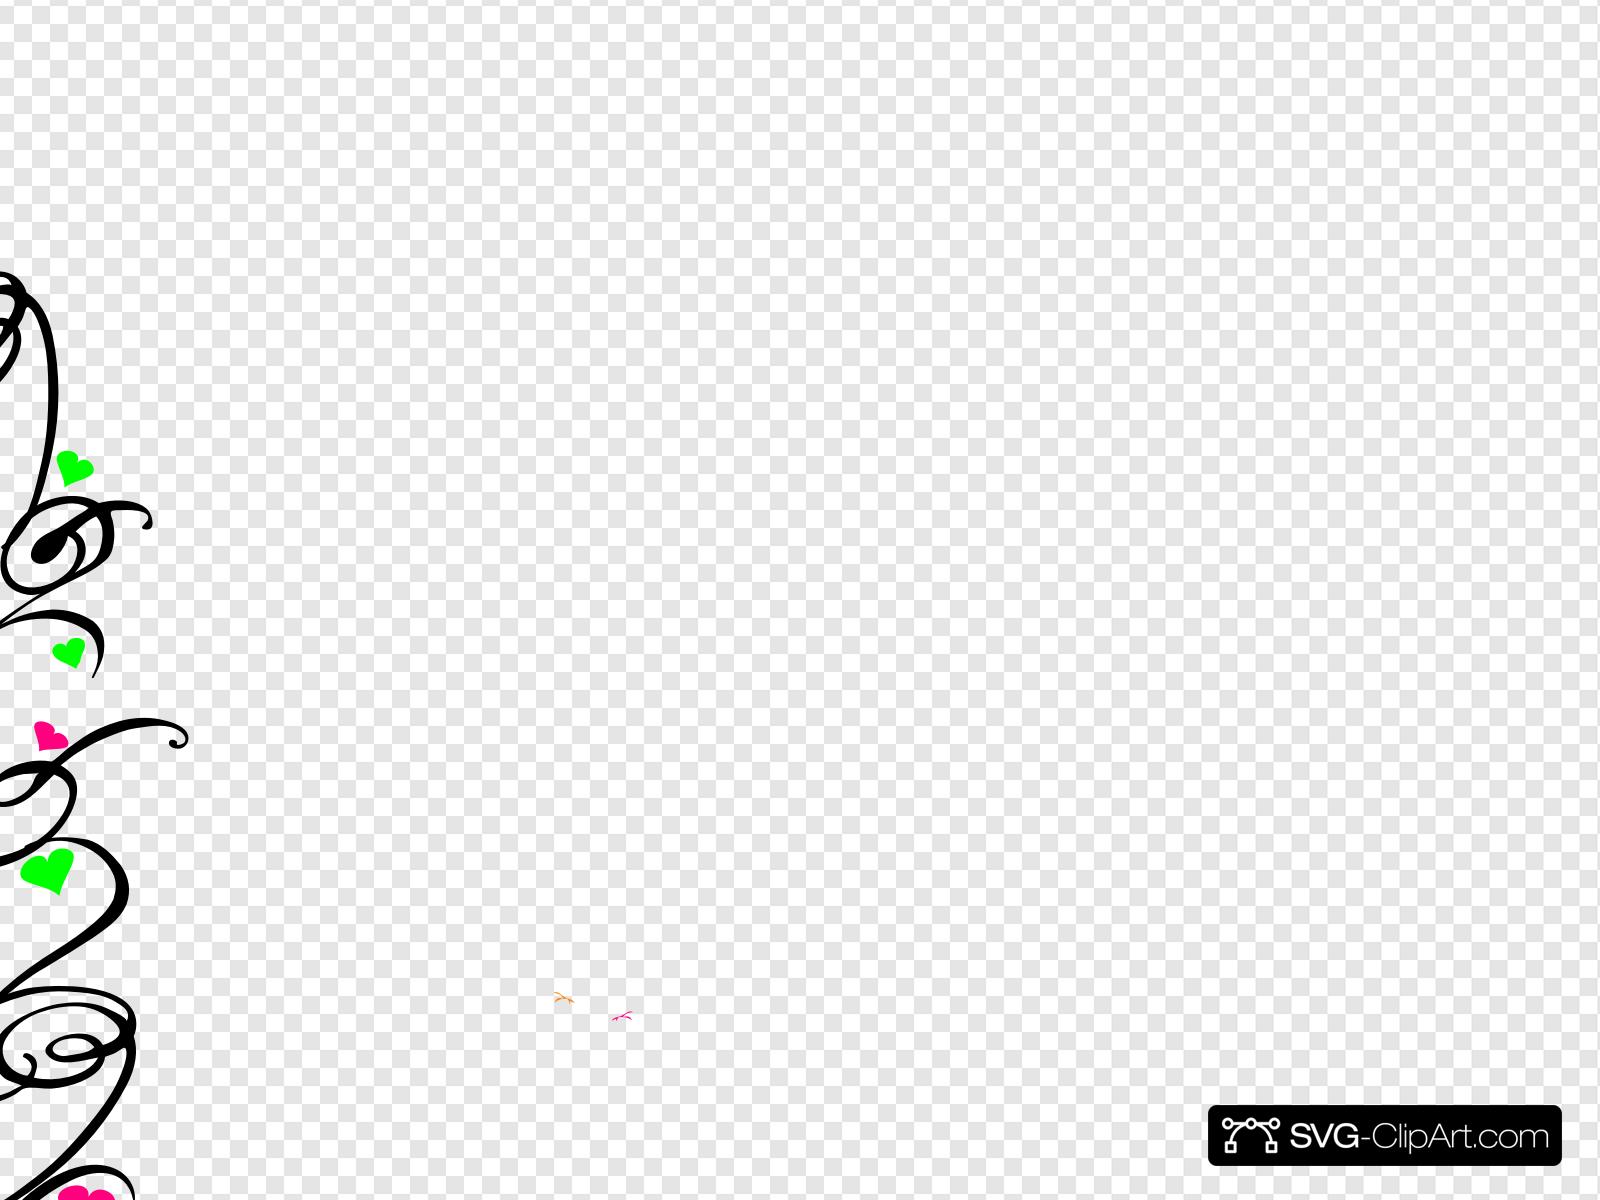 Nsp clipart free library Decorative Swirl Clip art, Icon and SVG - SVG Clipart free library